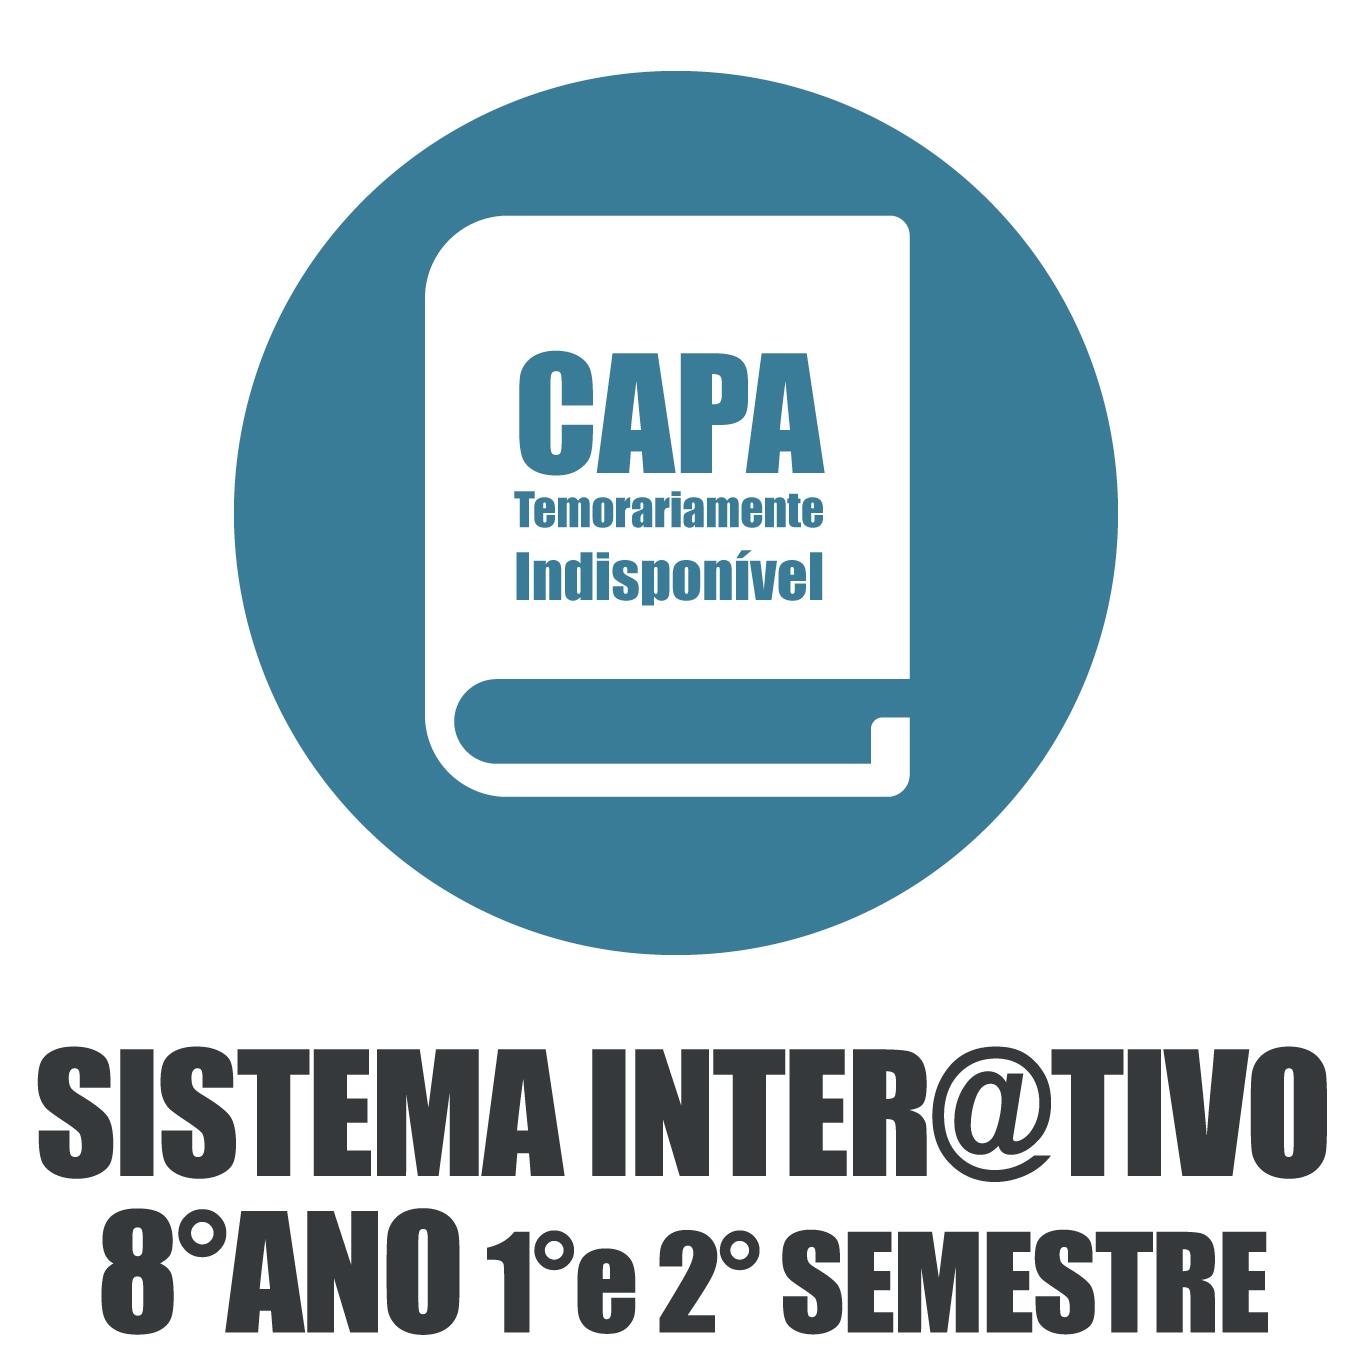 Sistema Itera@tivo de Ensino - 8° Ano - 1° e 2° Semestre